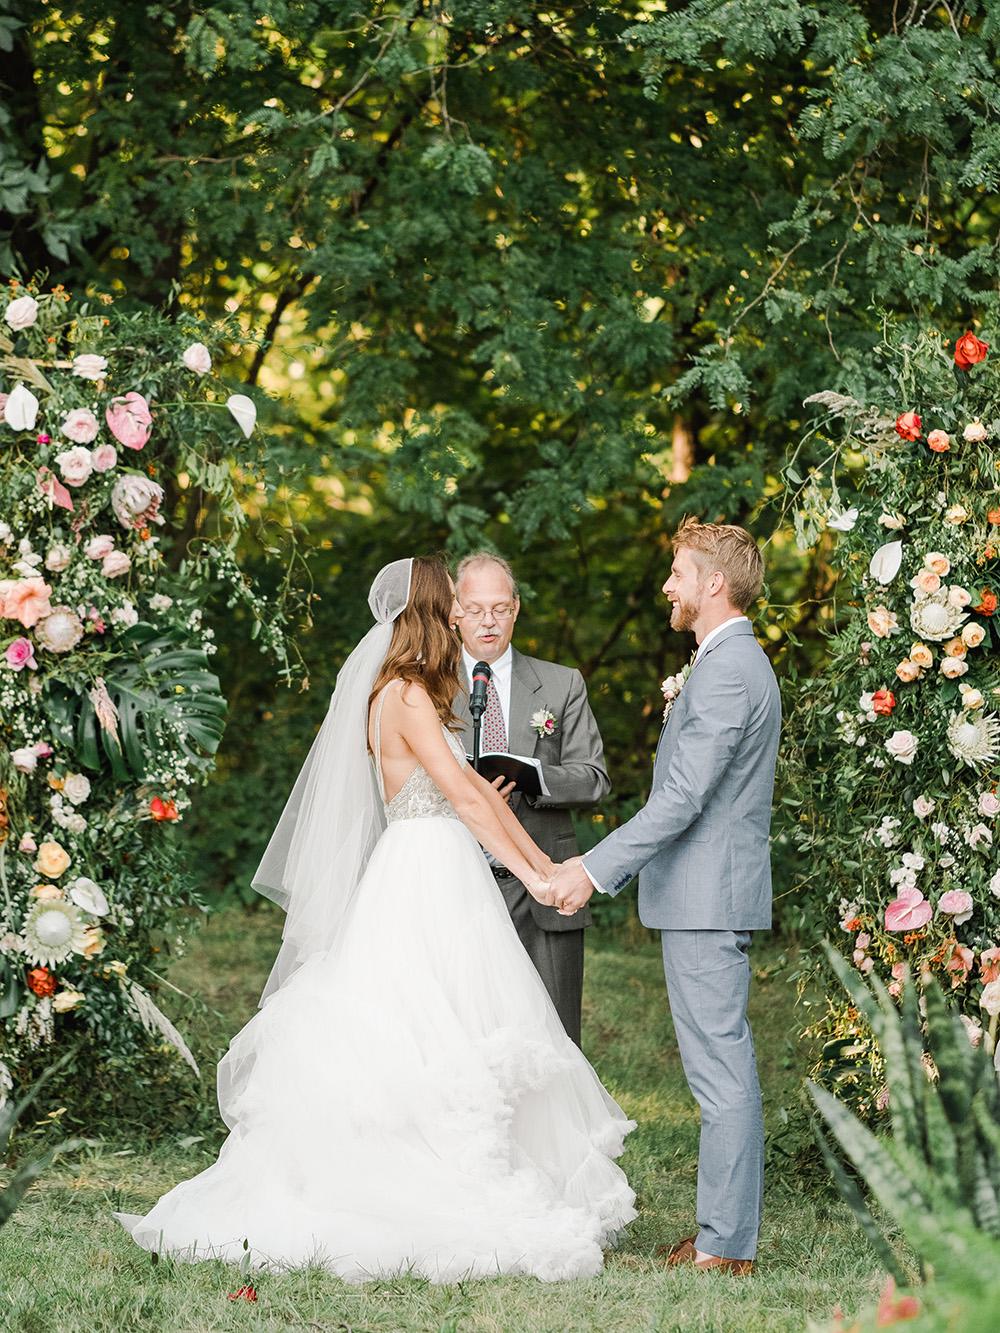 India___Corey___The_Wedding_-375.jpg